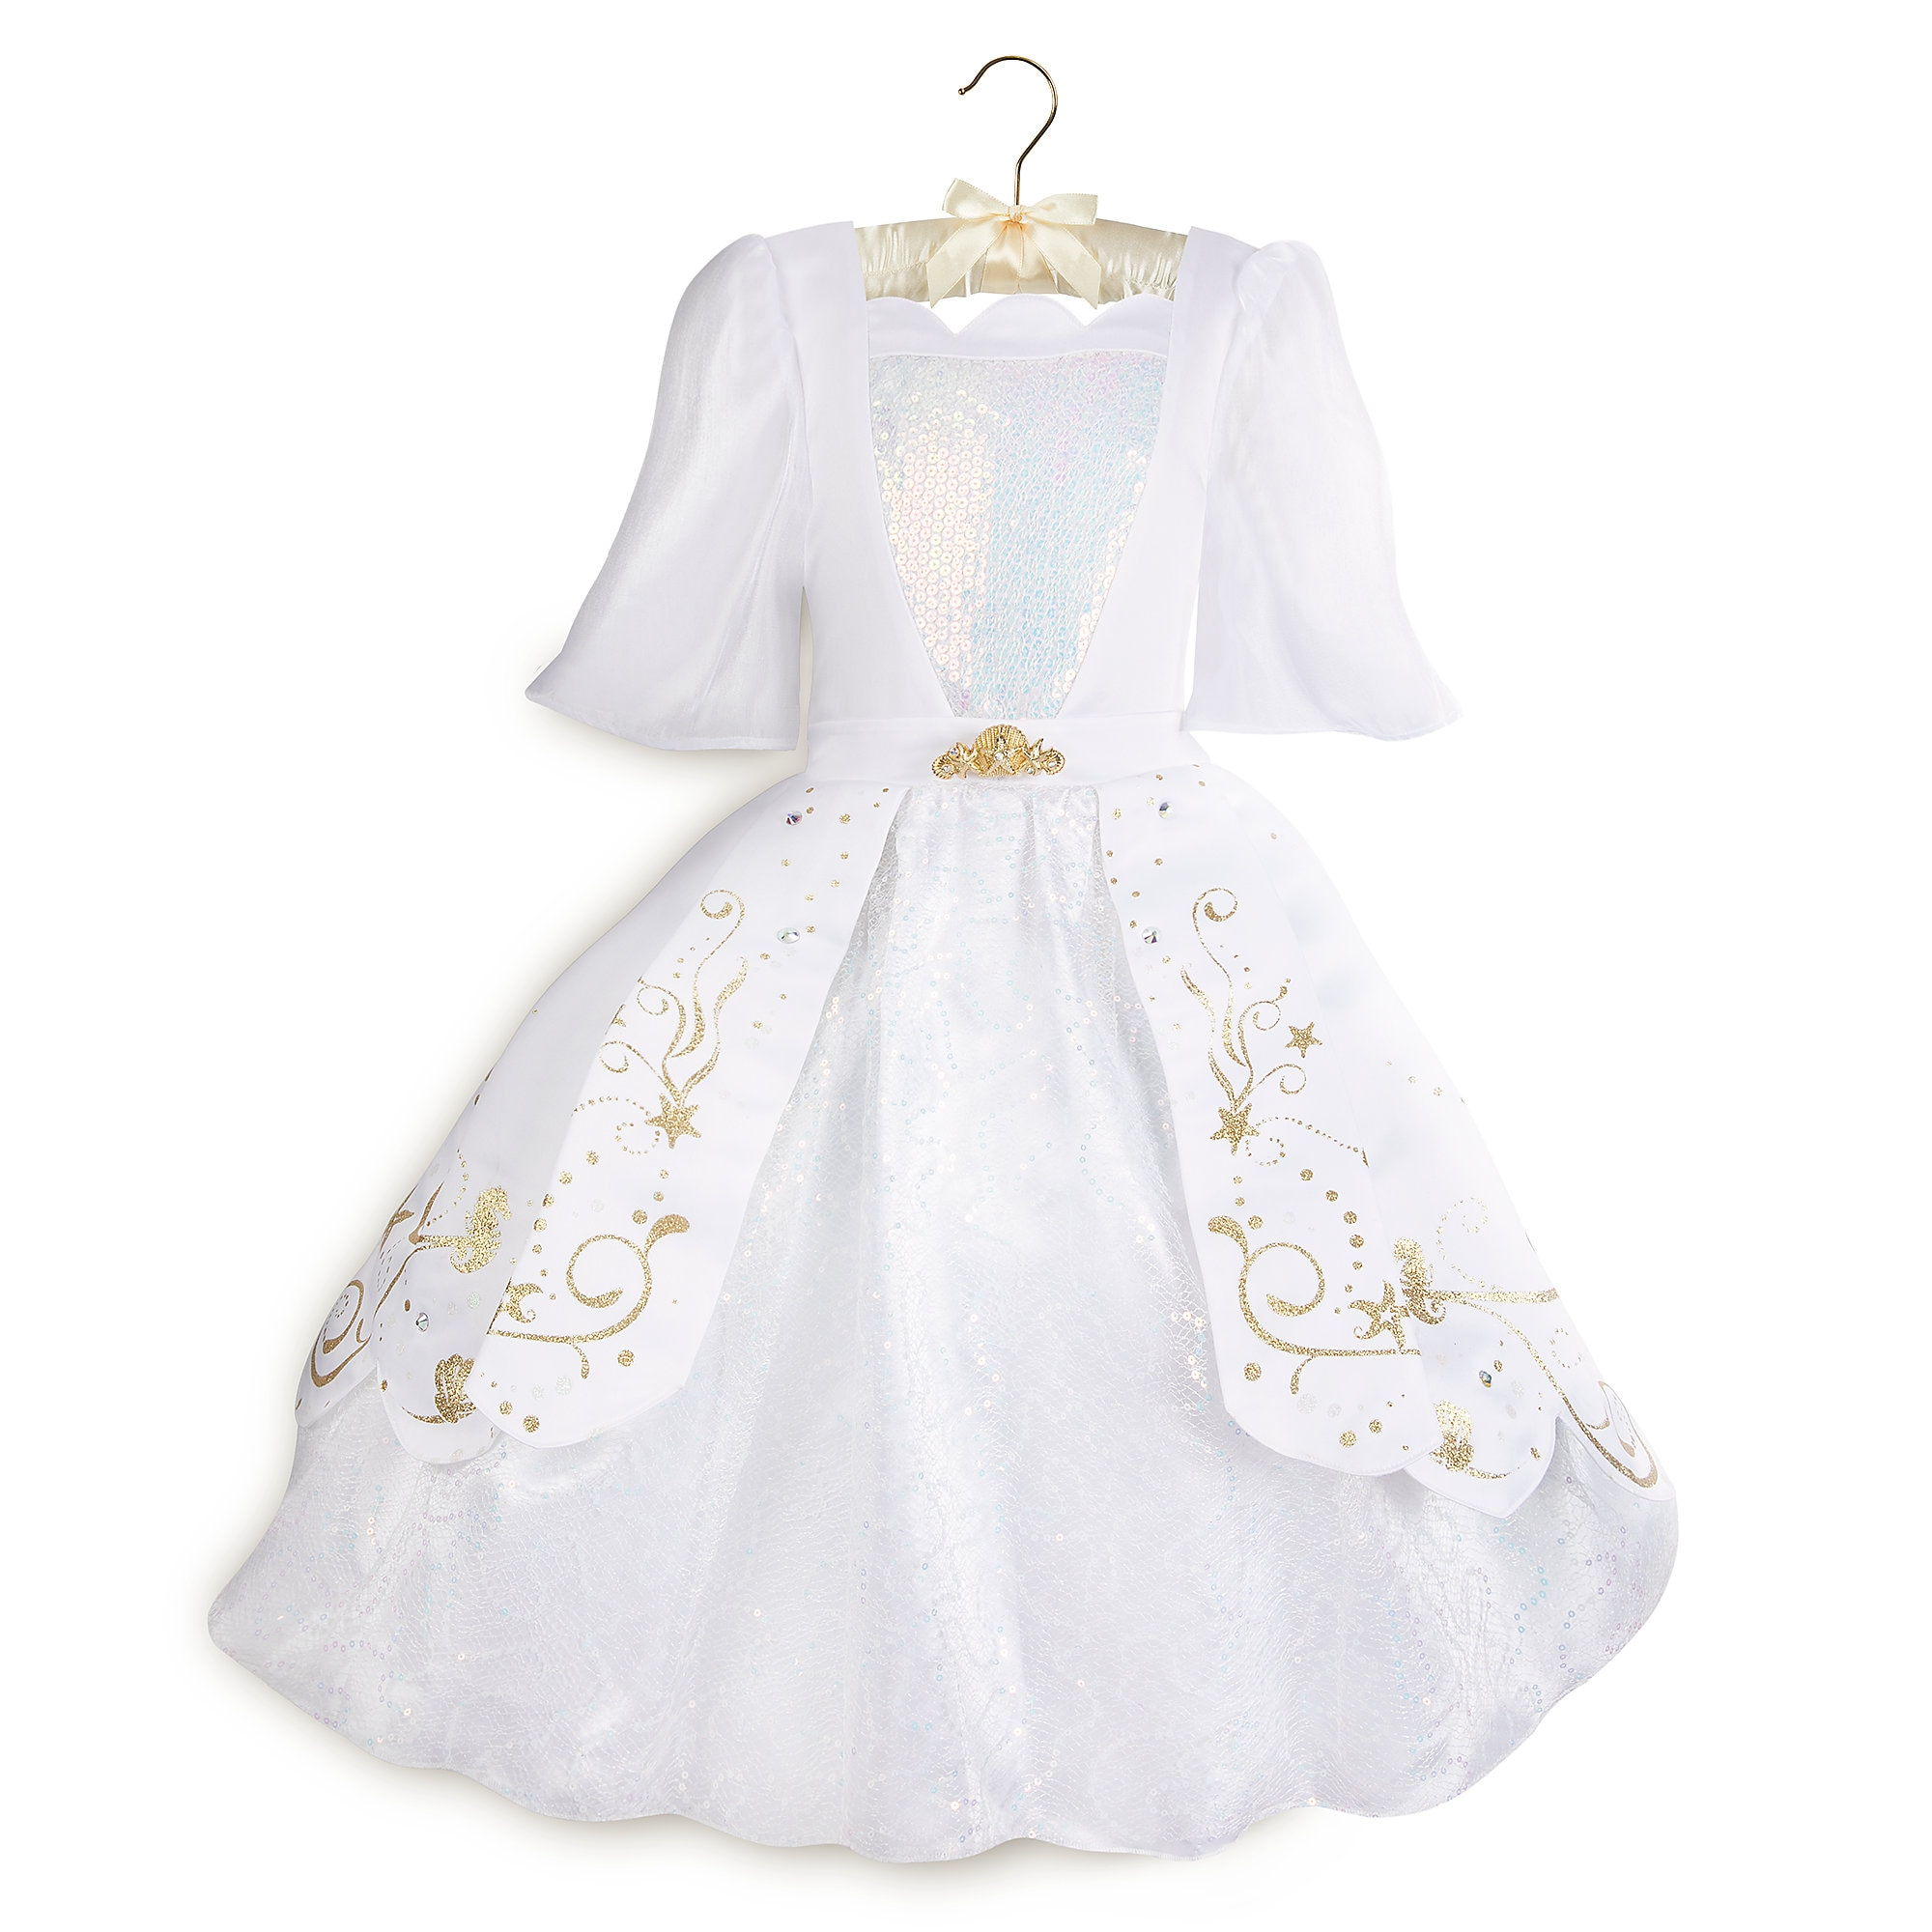 Ariel Designer Wedding Gown Costume for Kids